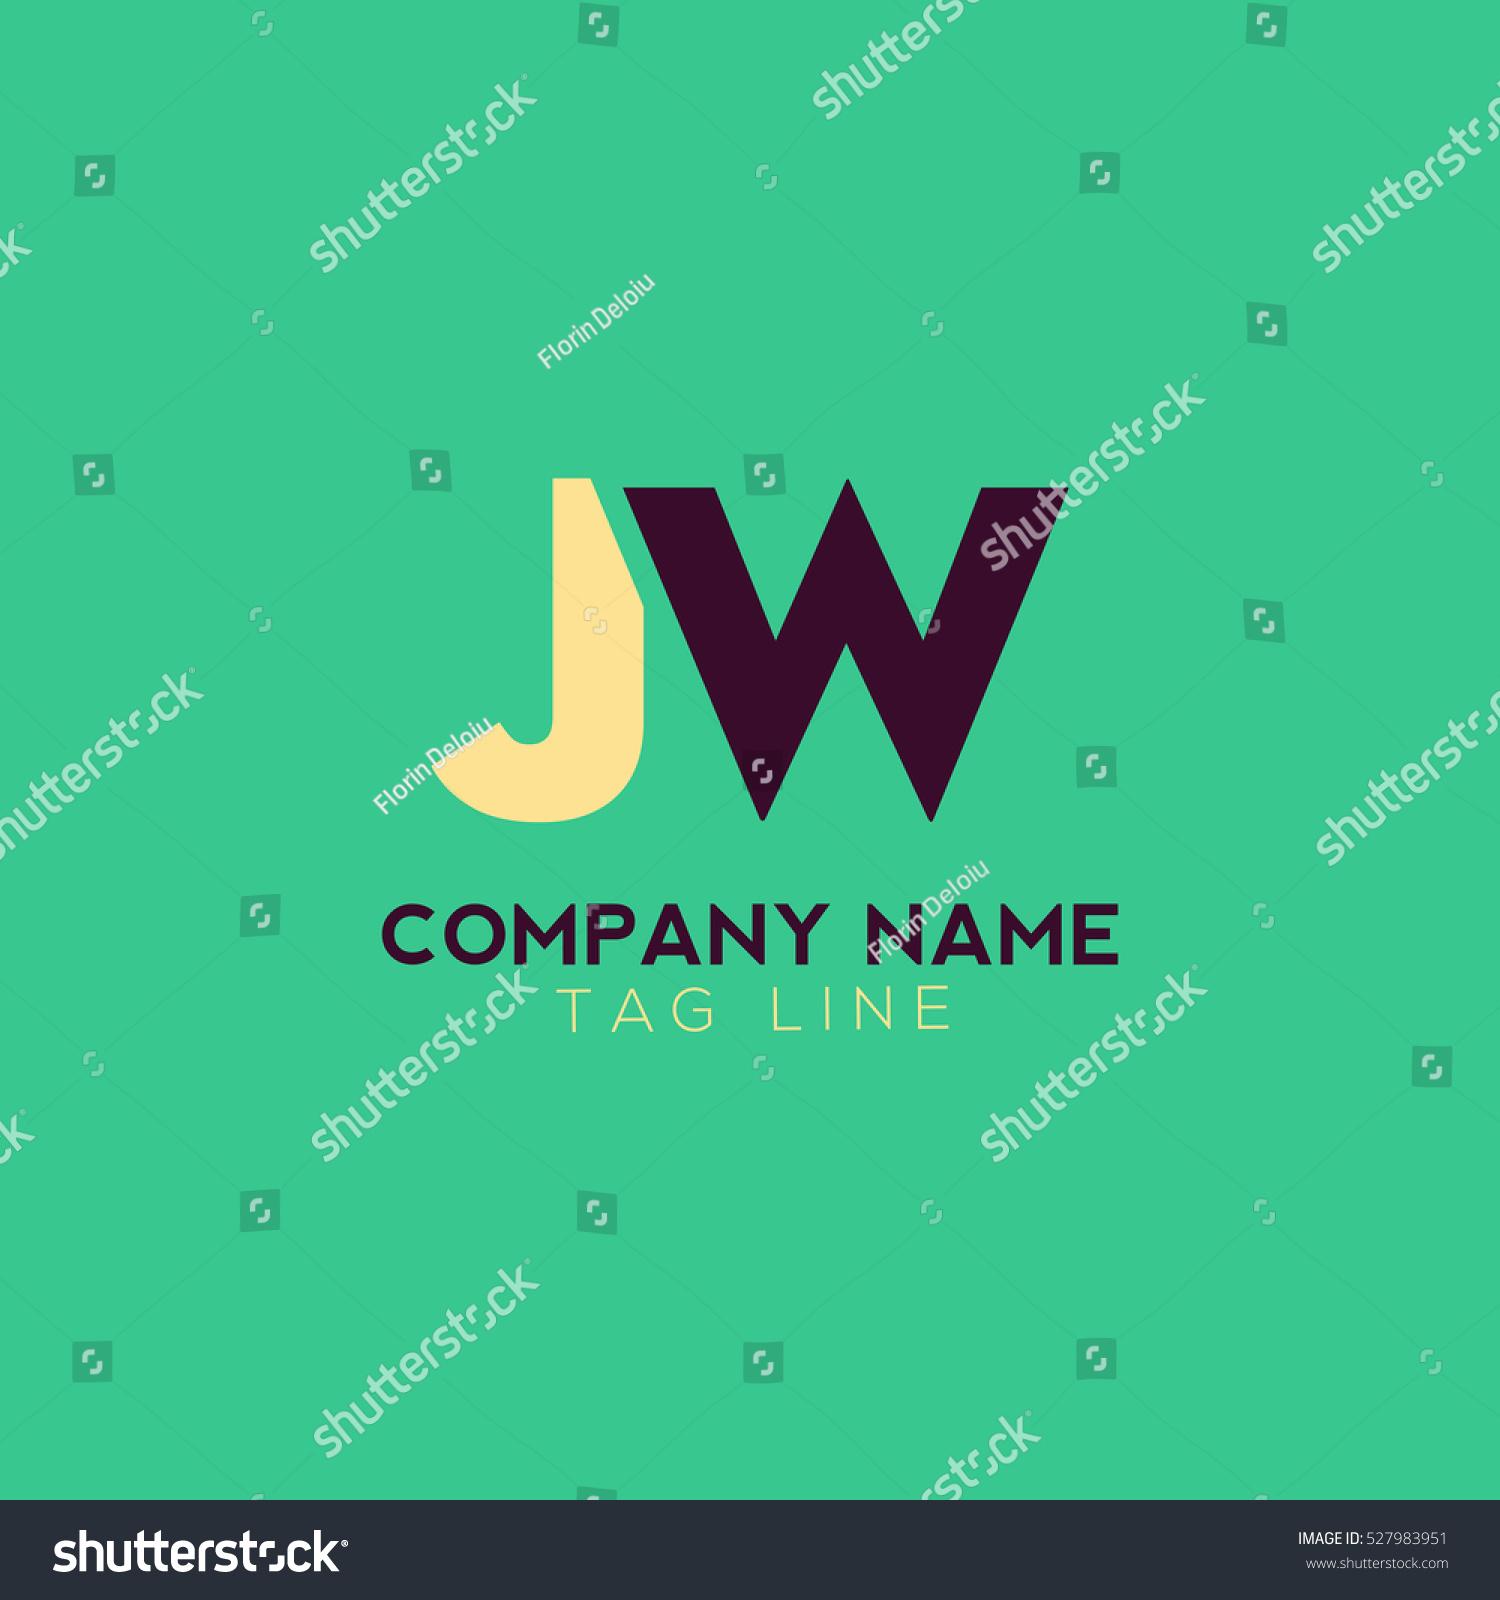 Jw 2019